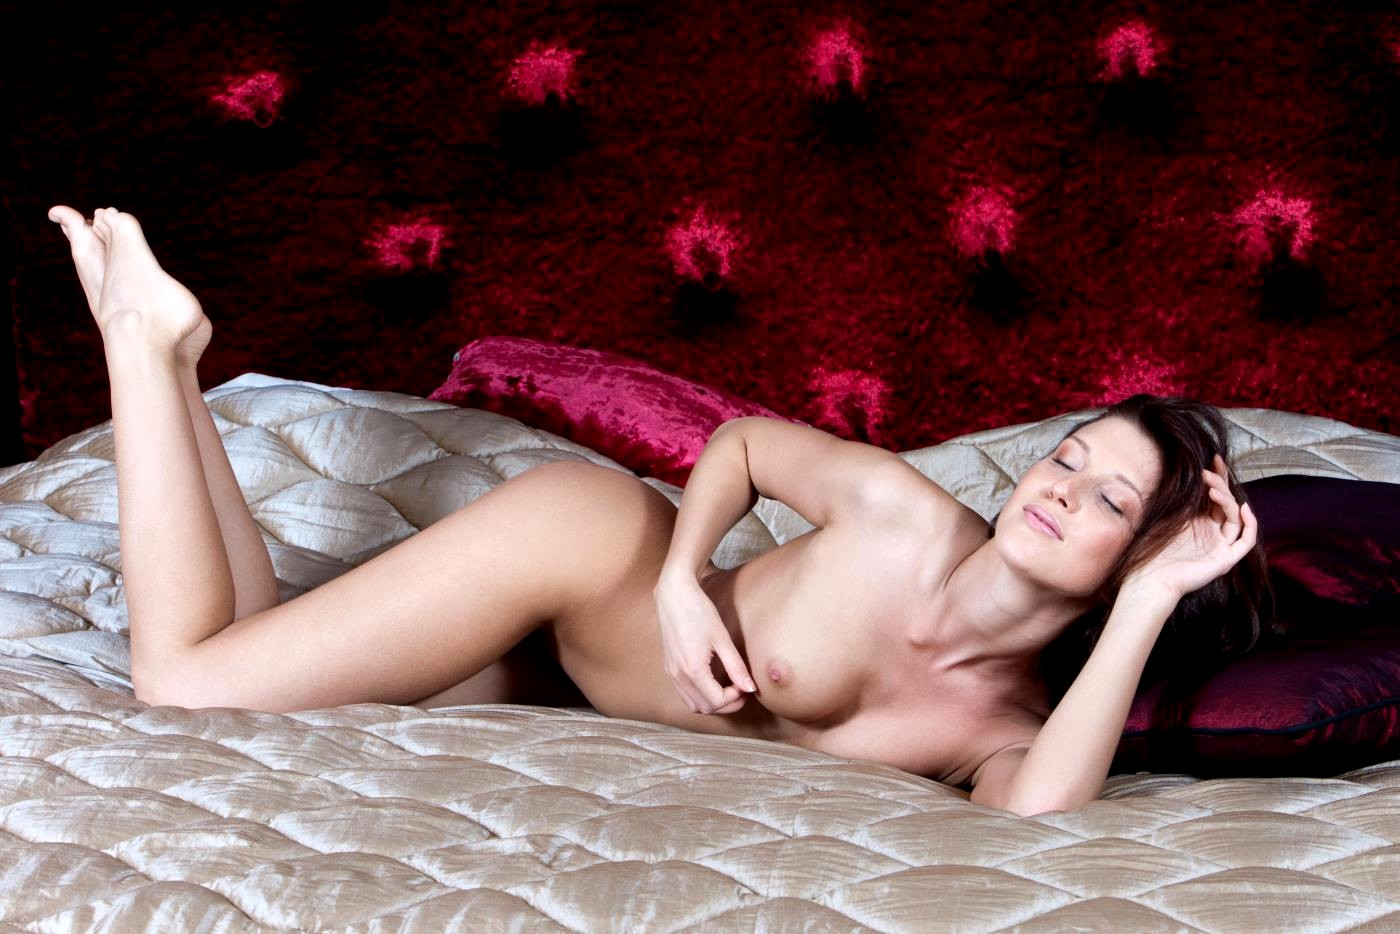 Kira kosarin poses nude for photo shoot